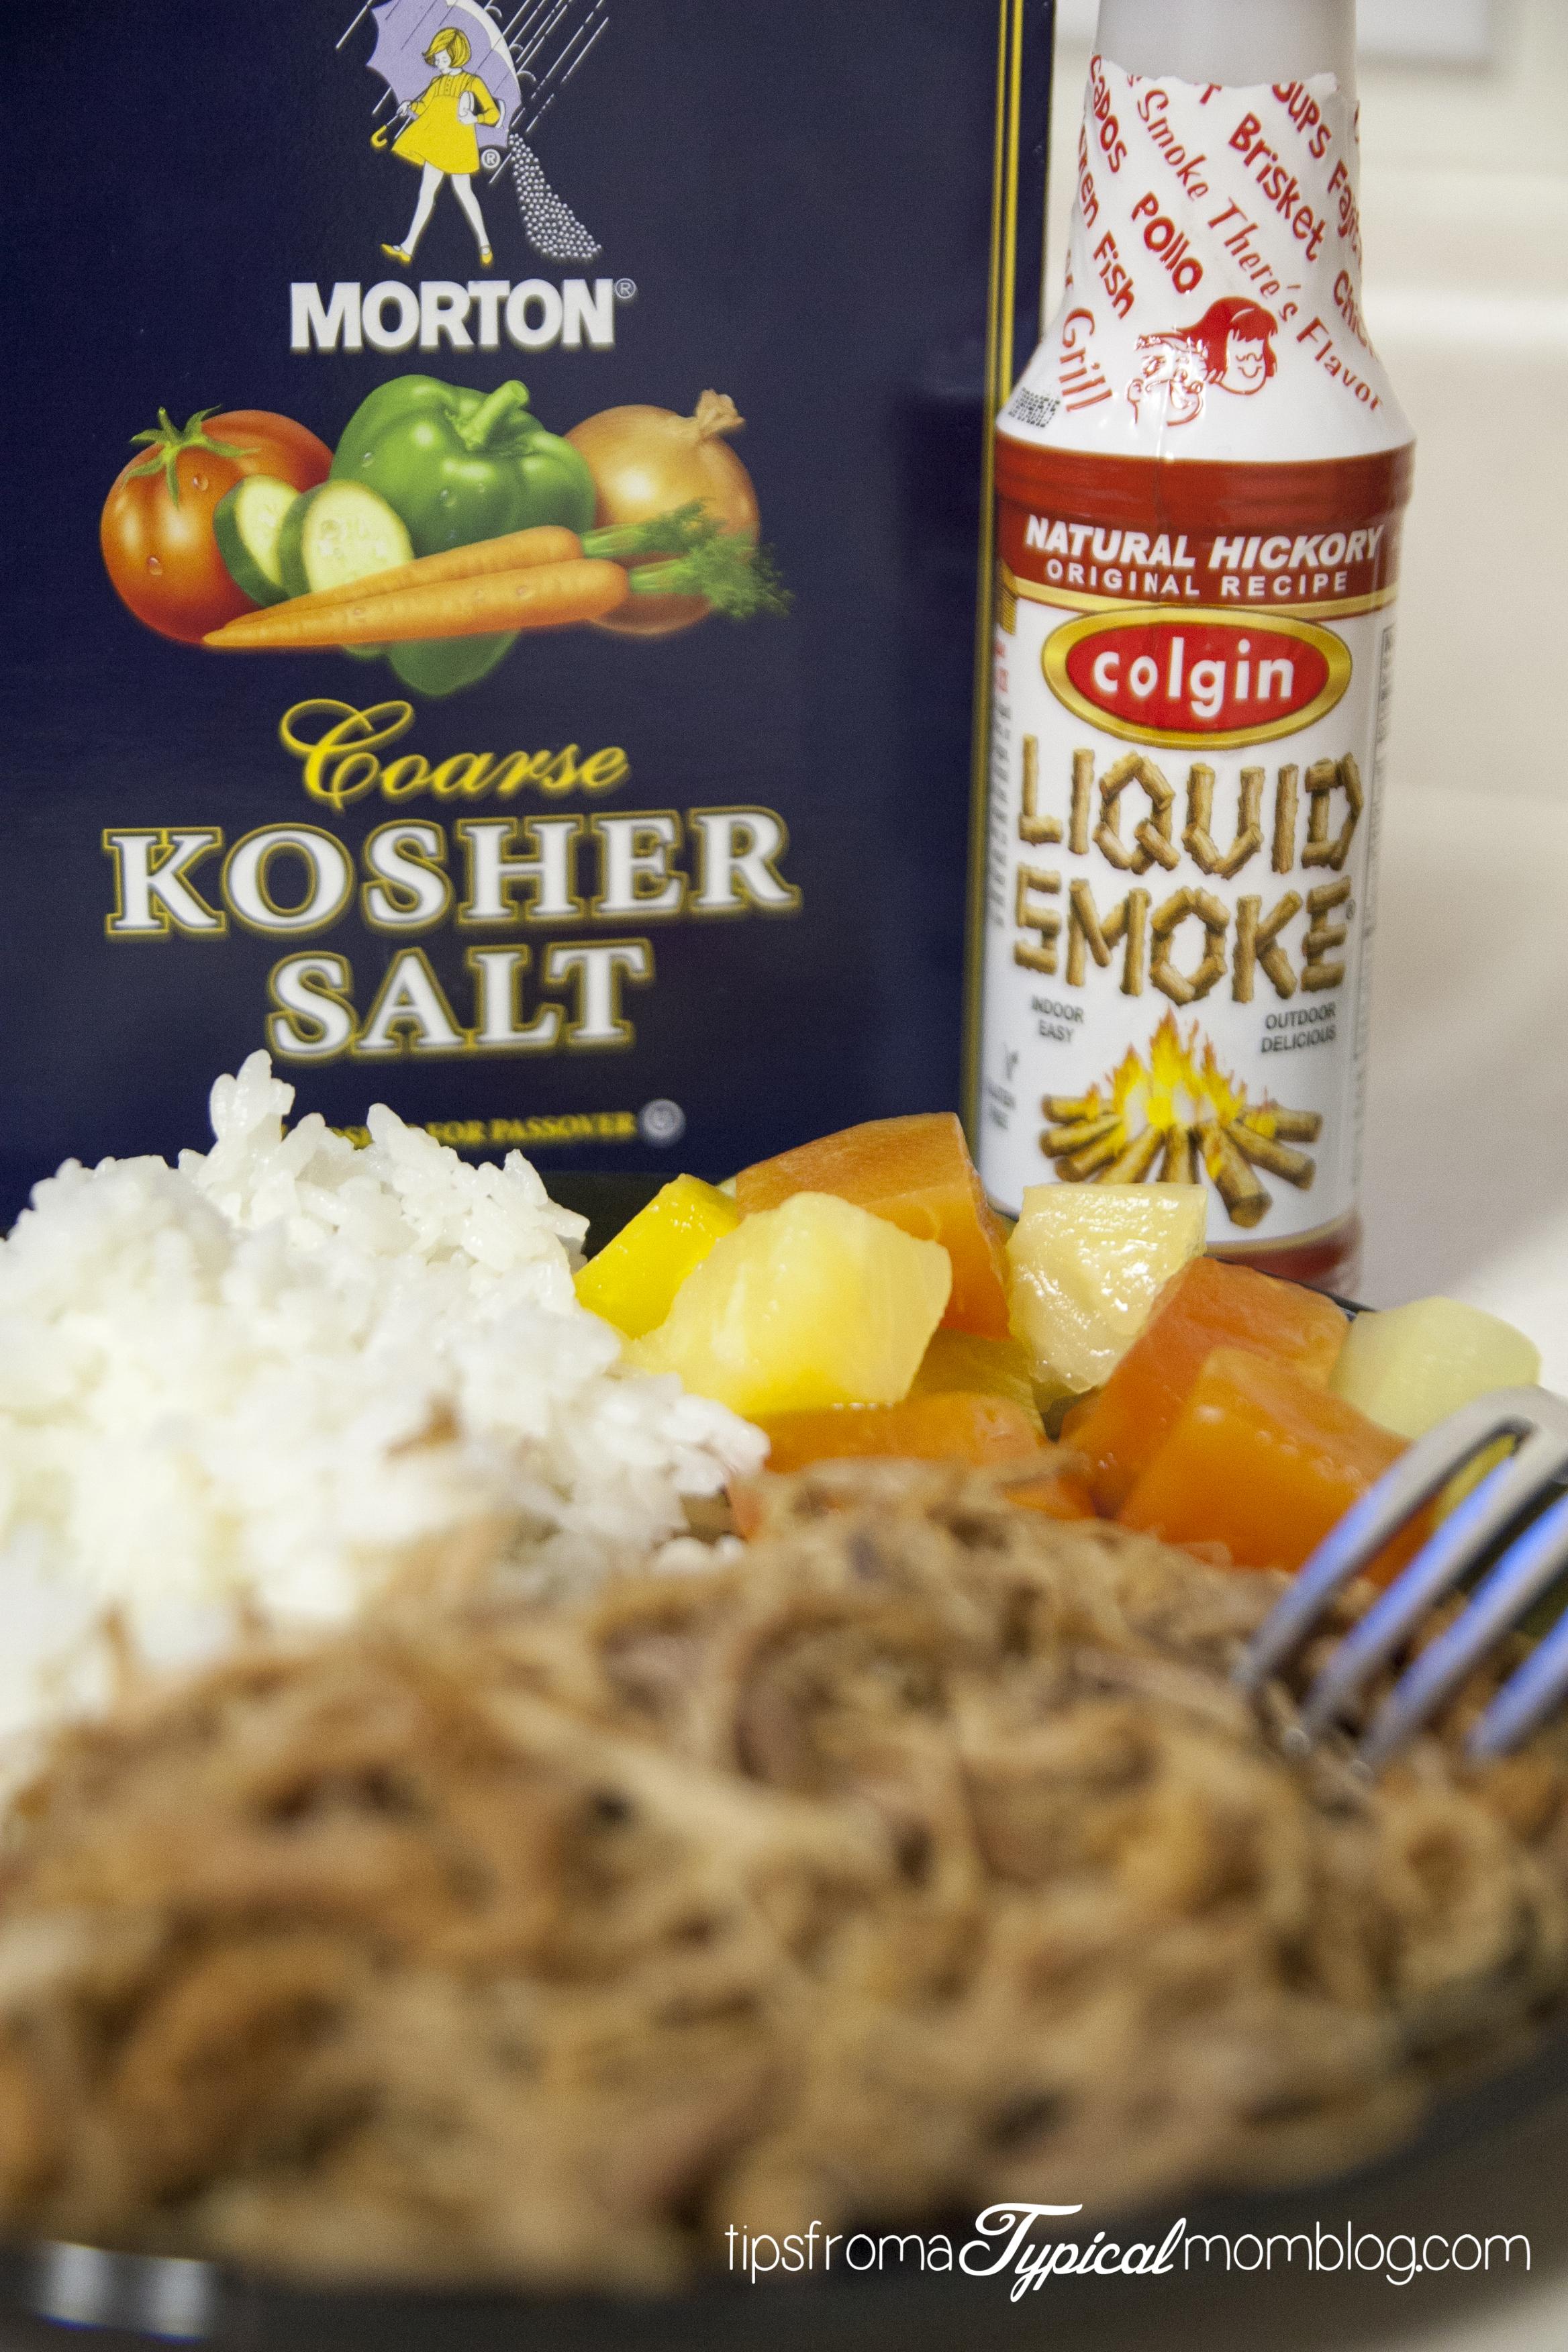 Crock Pot Kalua Pork Dinner - Tips from a Typical Mom